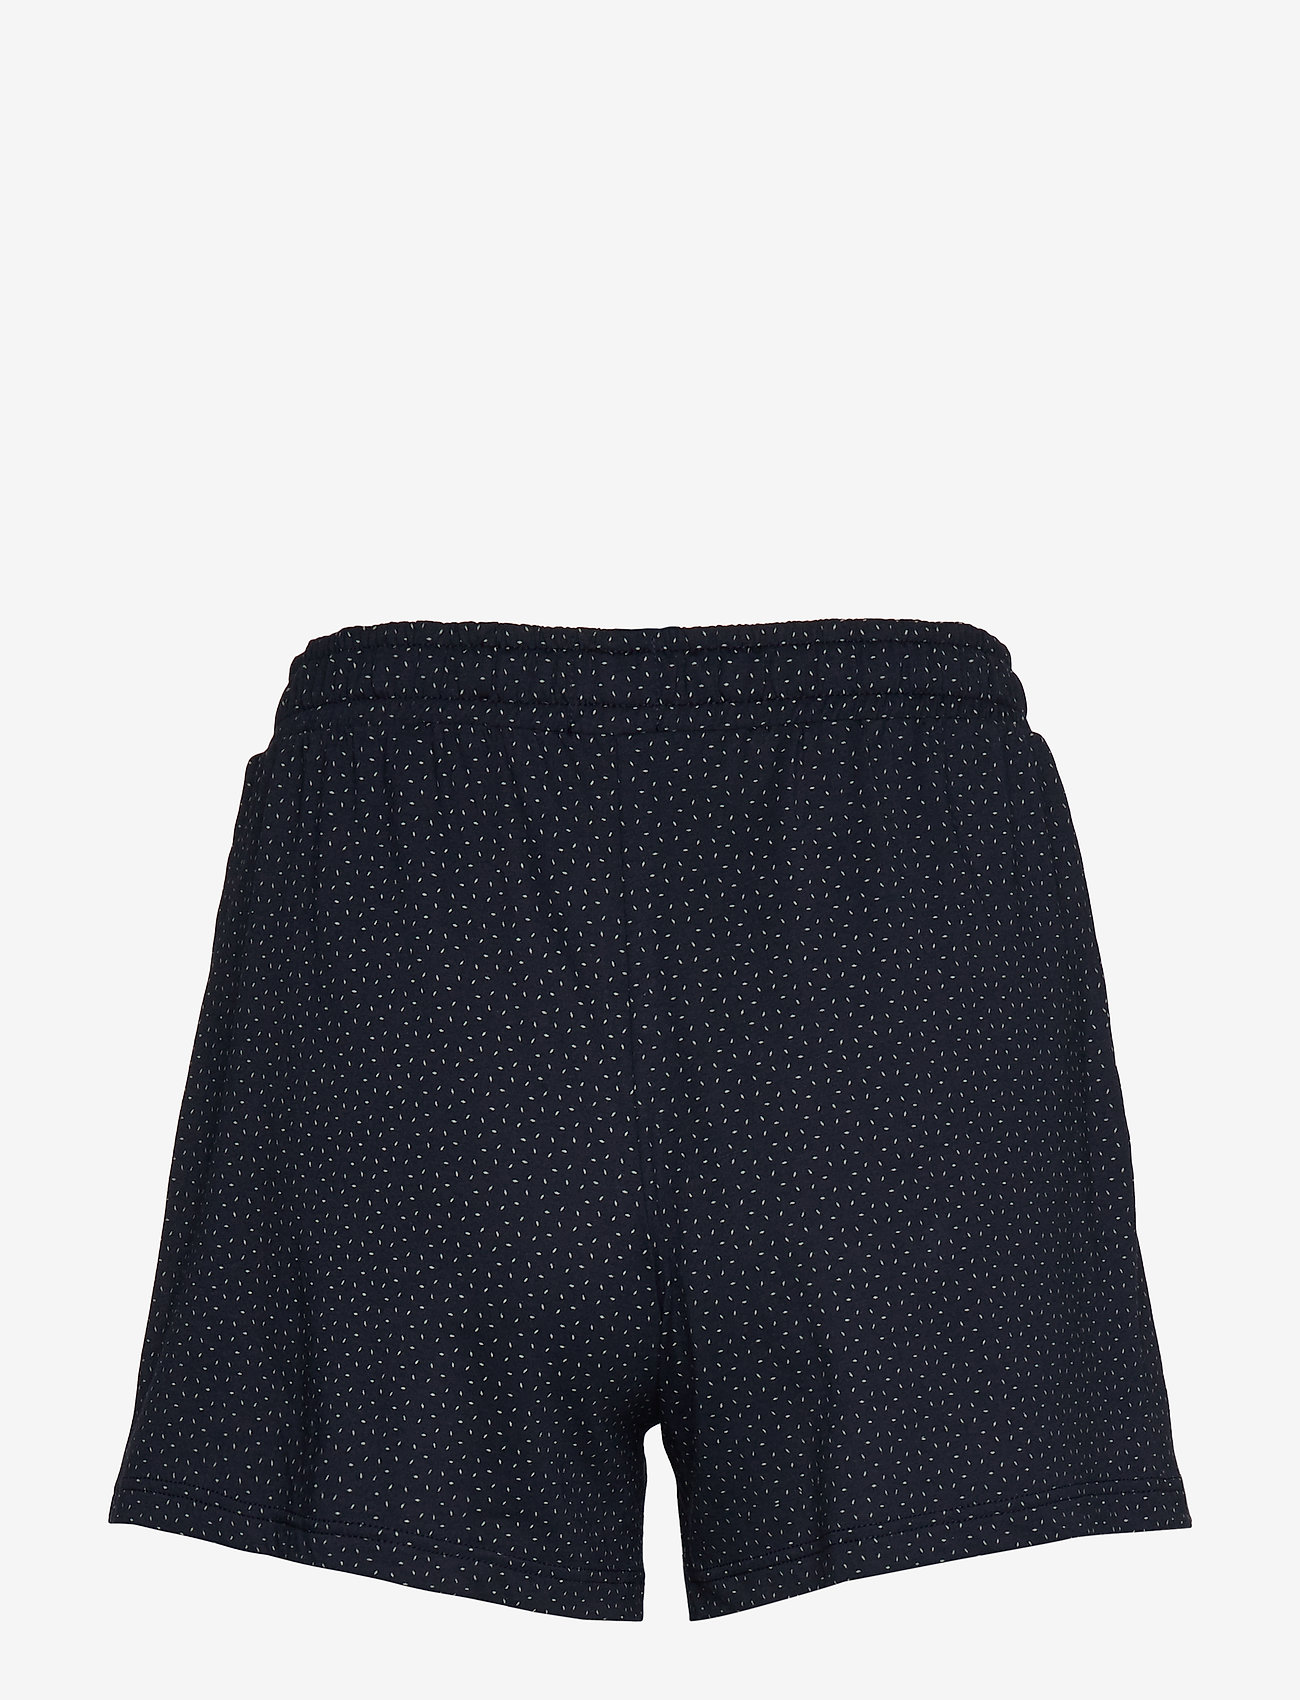 Schiesser - Shorts - shorts - nightblue - 1